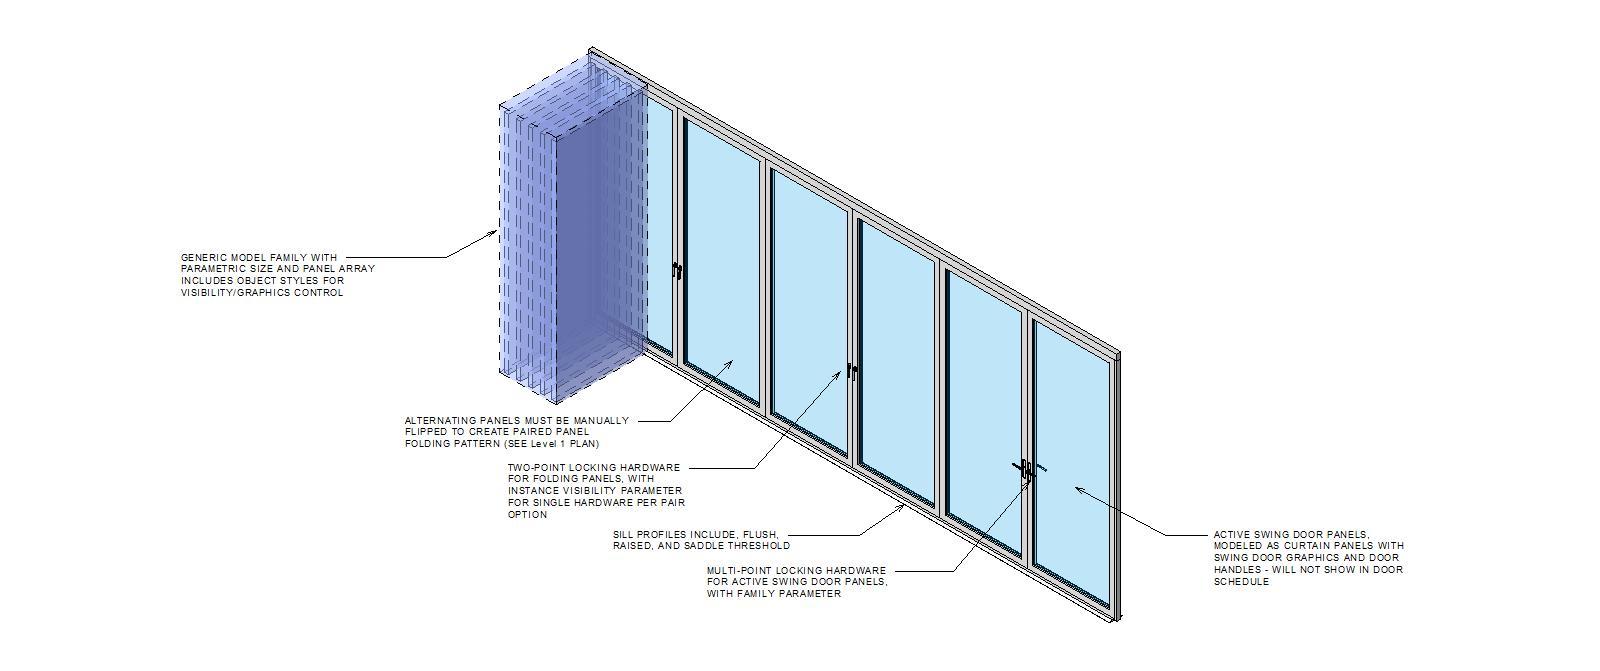 Nana Wall Systems Inc. BIM content  sc 1 st  Arcat & Nana Wall Systems Inc. Entrances Storefronts and Curtain Walls ...